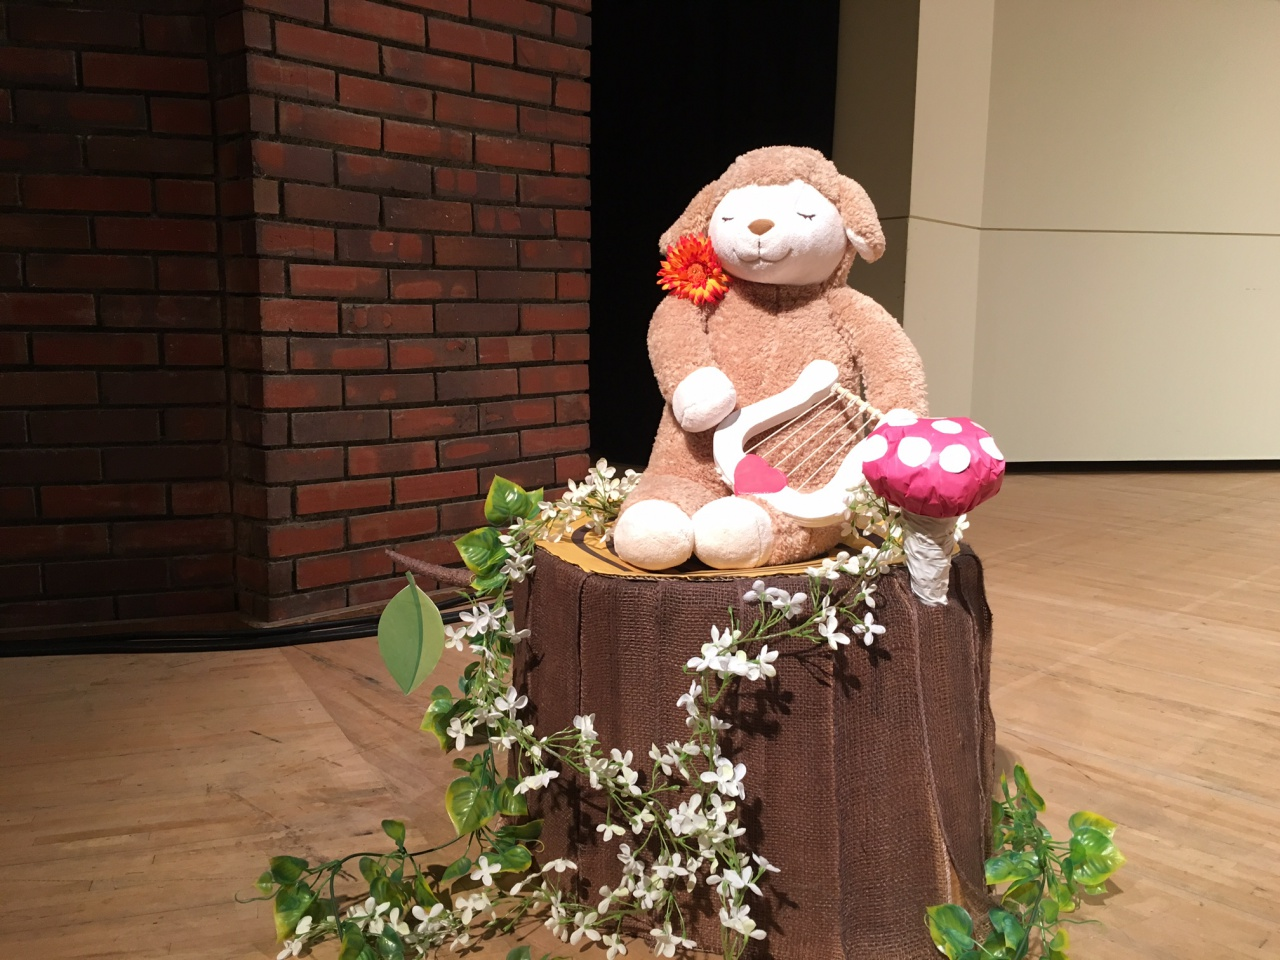 M響プレゼンツ【音楽の森】にご来場いただきまして誠にありがとうございました♪